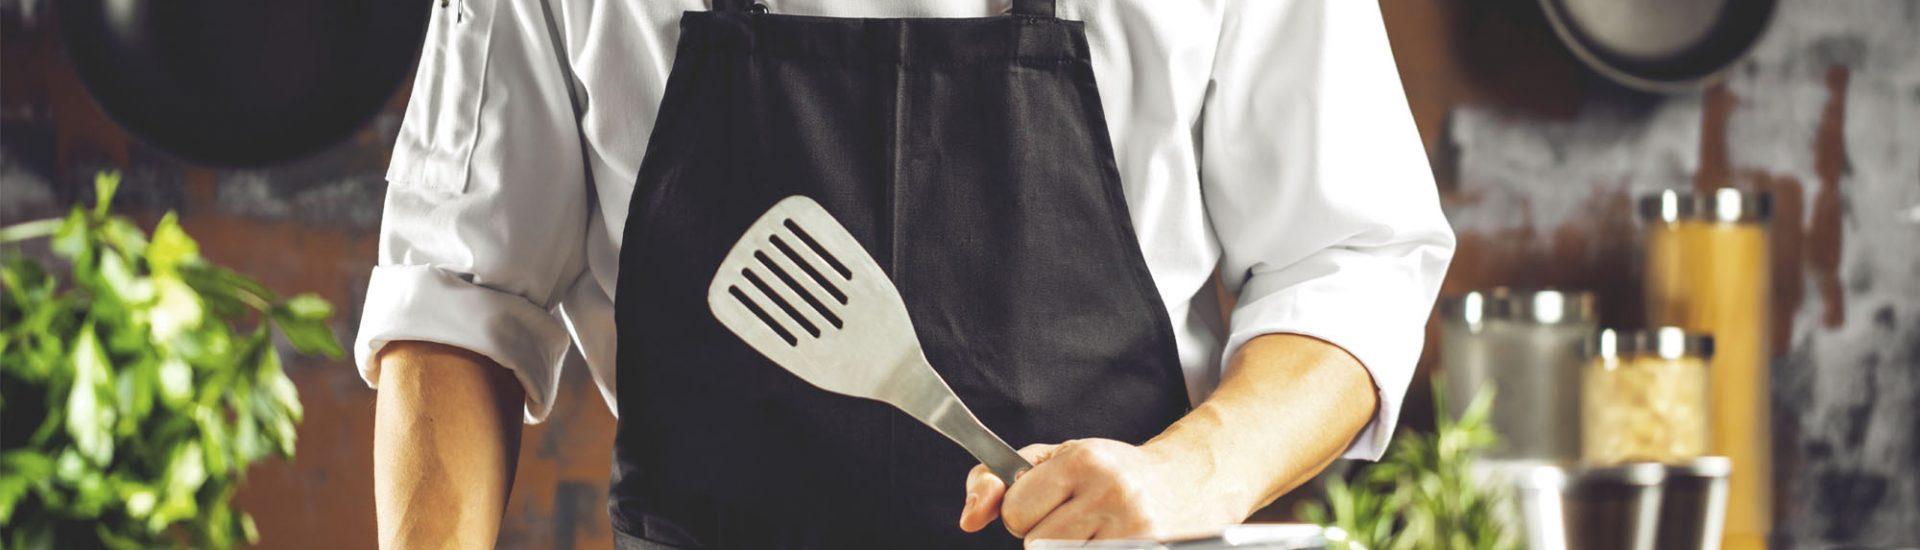 Itati Tracht Oktoberfest Kochschürze Küchenschürze Grillschürze lustige Schürze